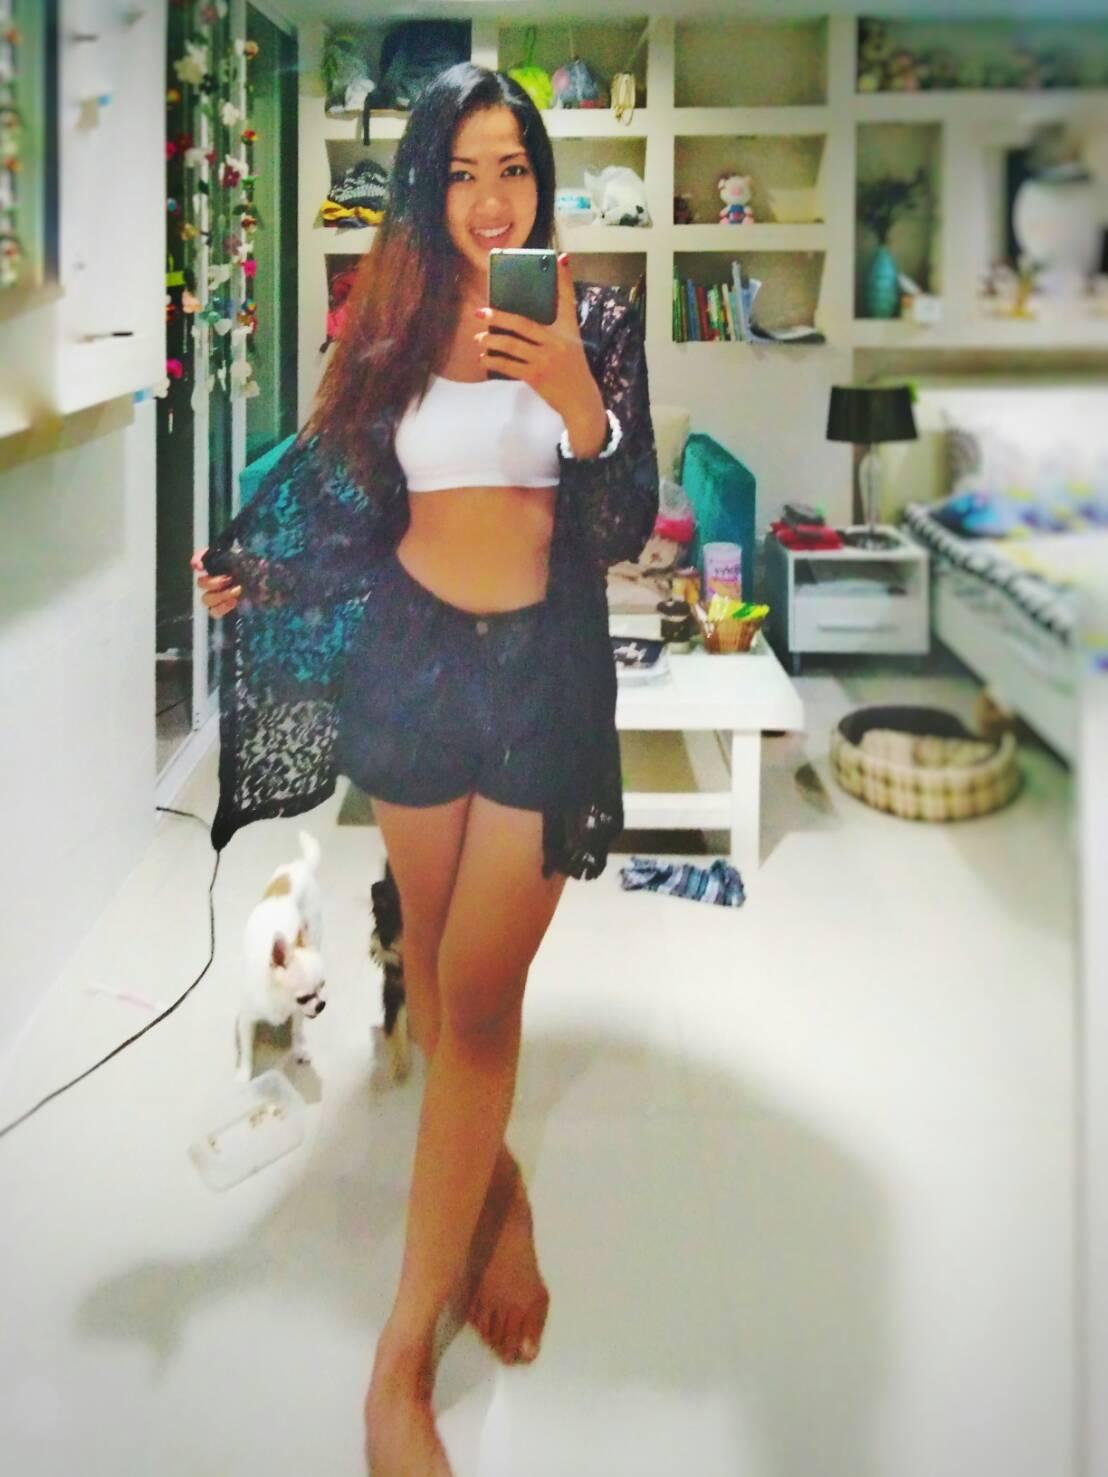 dating in the dark mature escort thailand